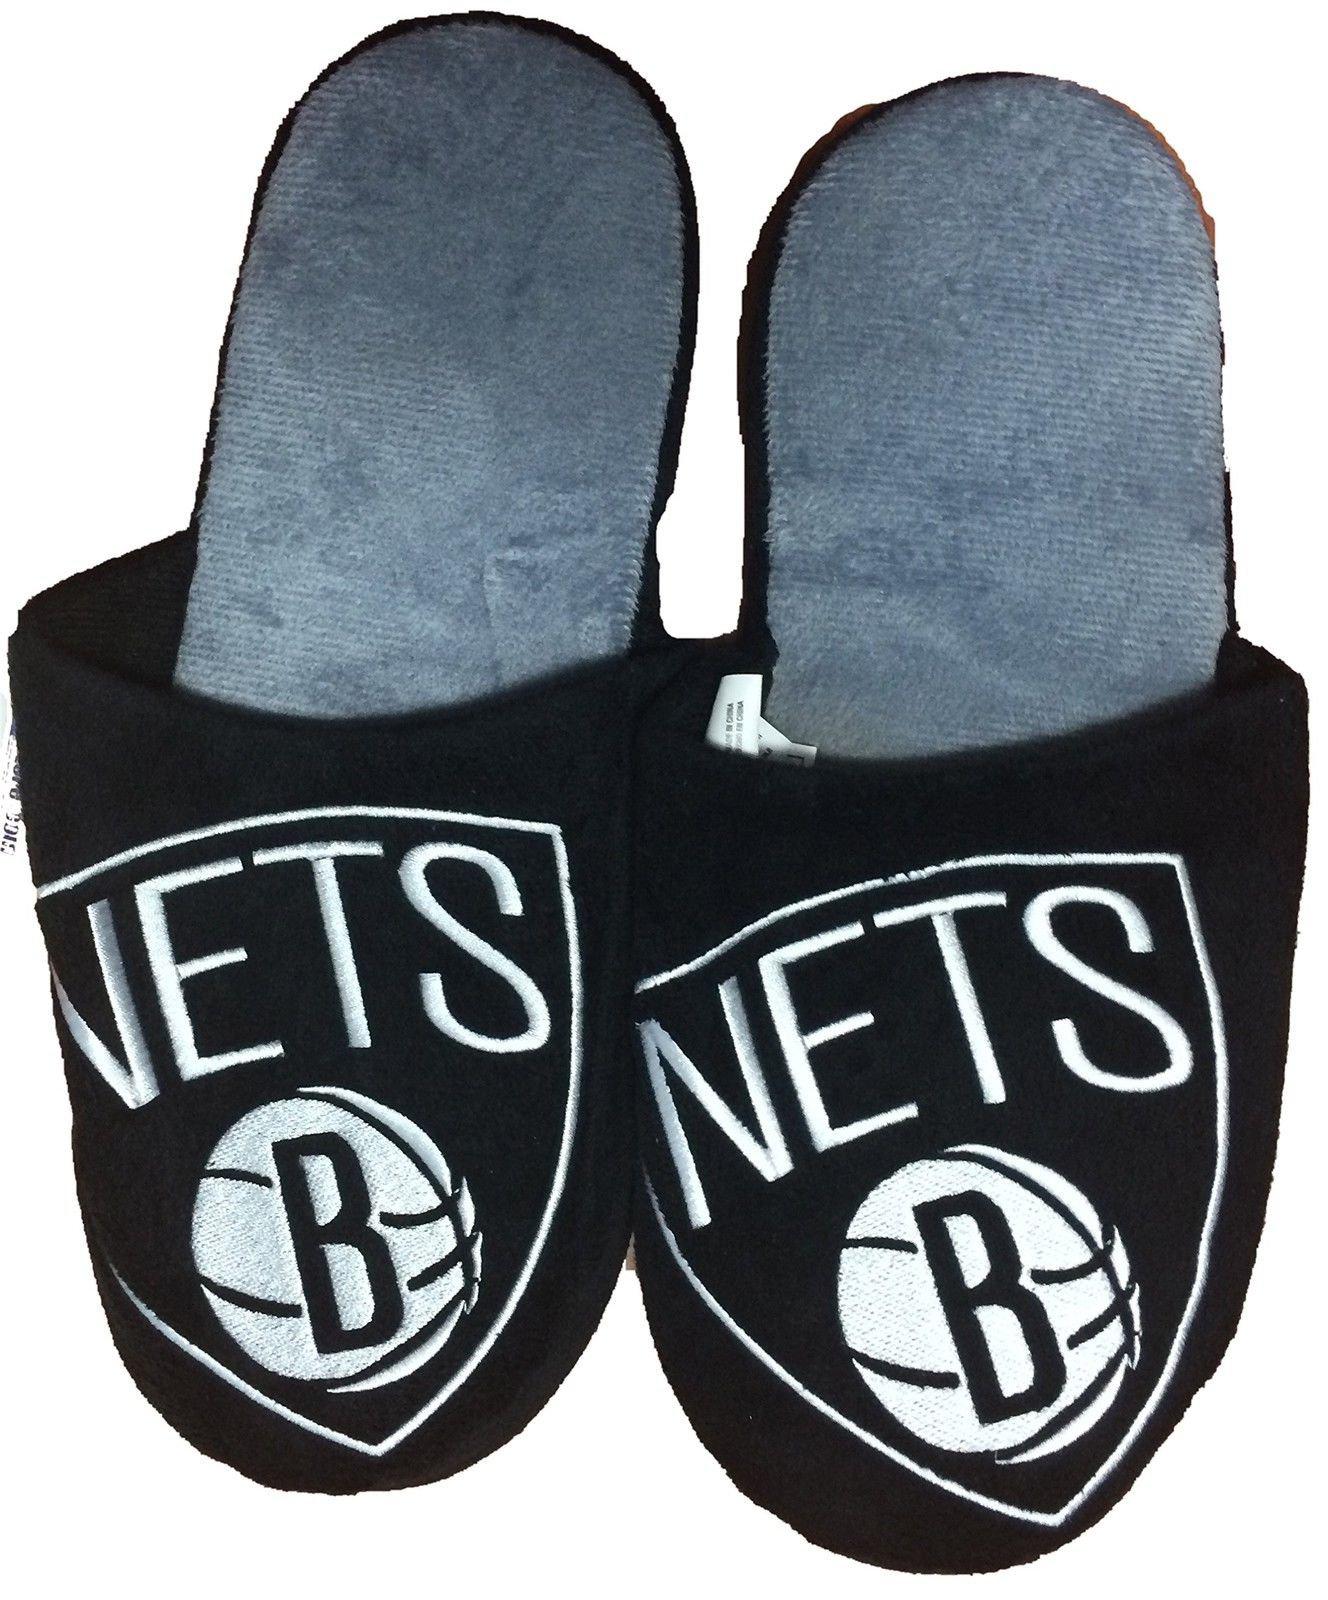 NBA Brooklyn Nets Men's Team Logo Slippers Black (Medium (9-10)) by NBA